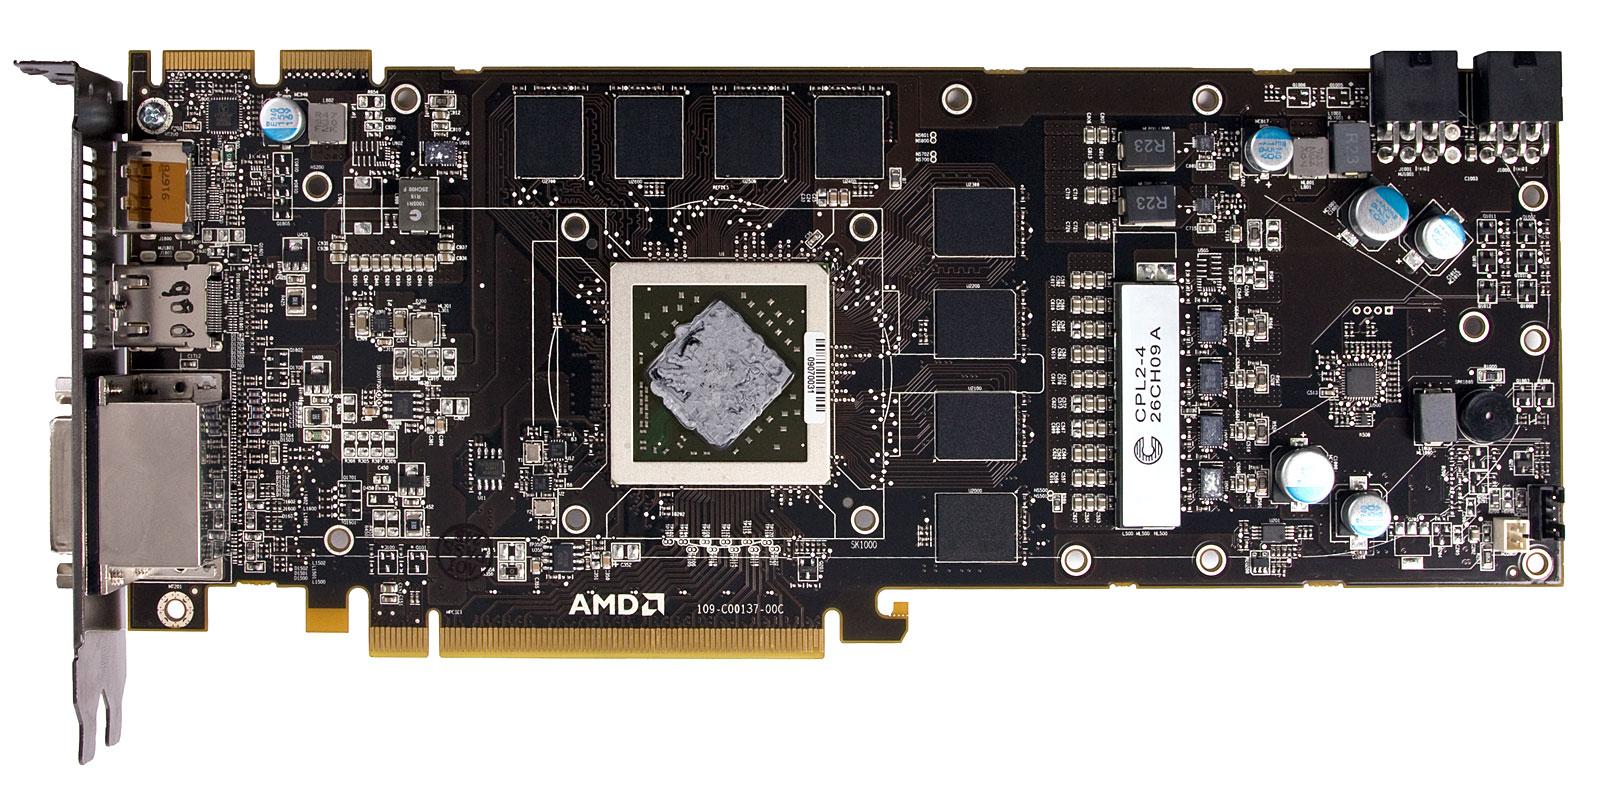 Ati Radeon Hd 5870 Architecture Analysis